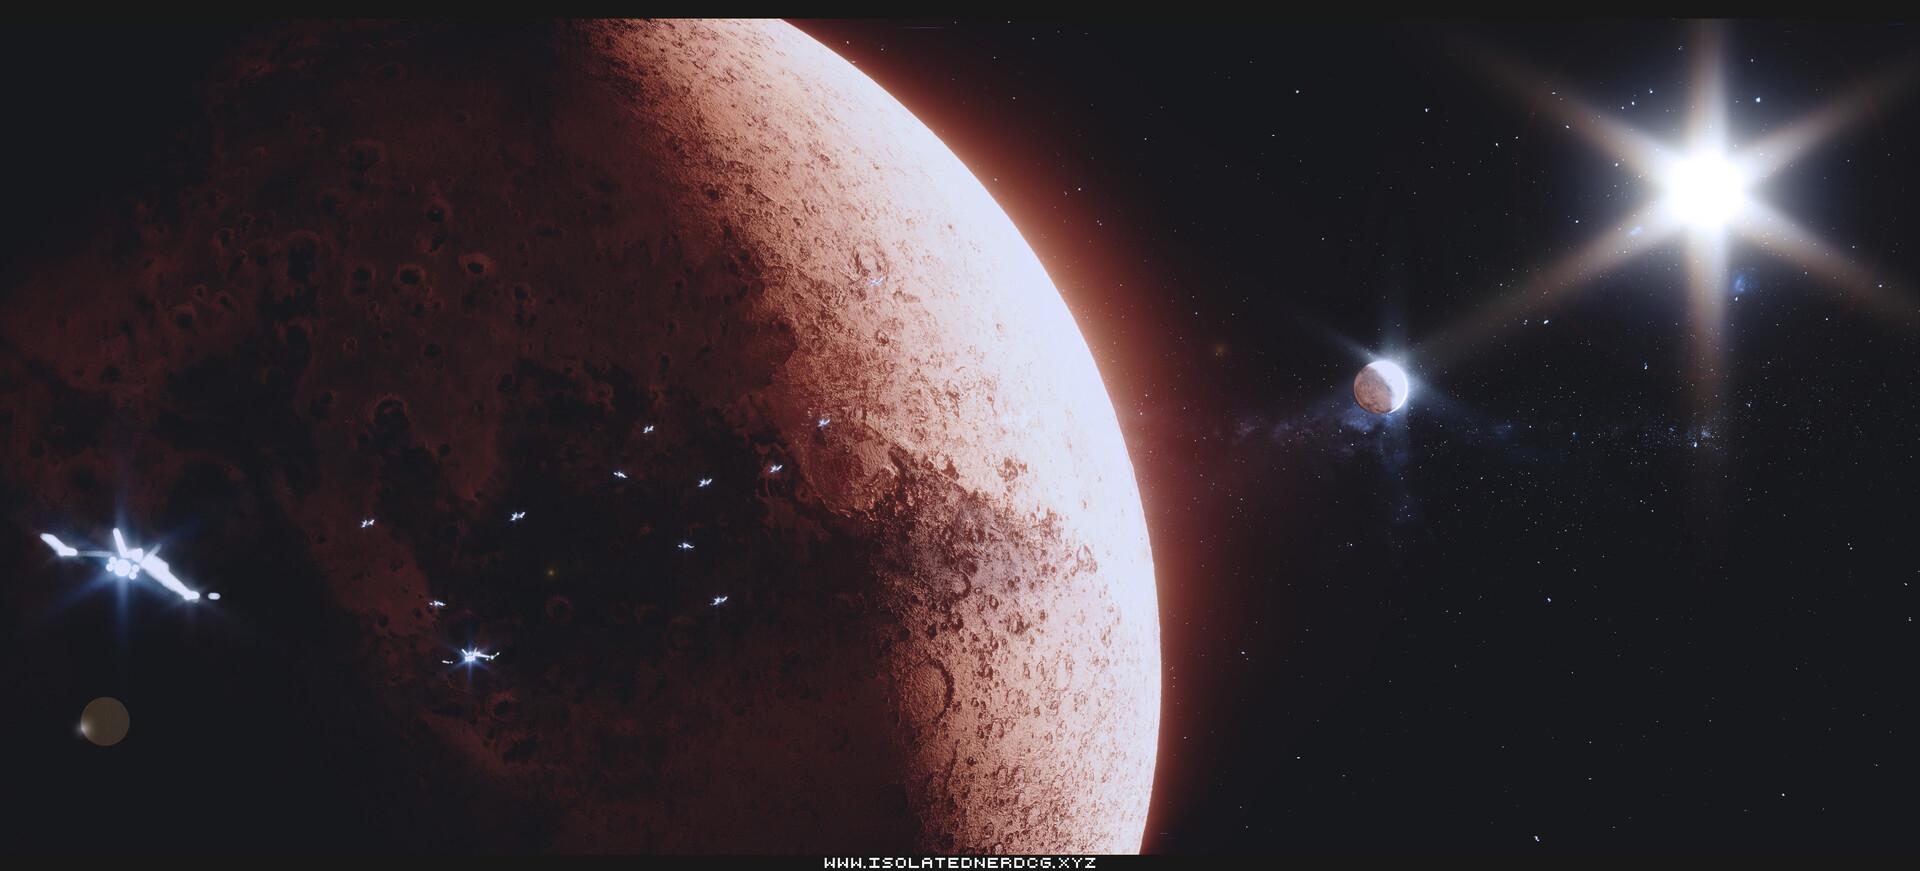 Matias toloza isolatednerdcg planet 1 artstation